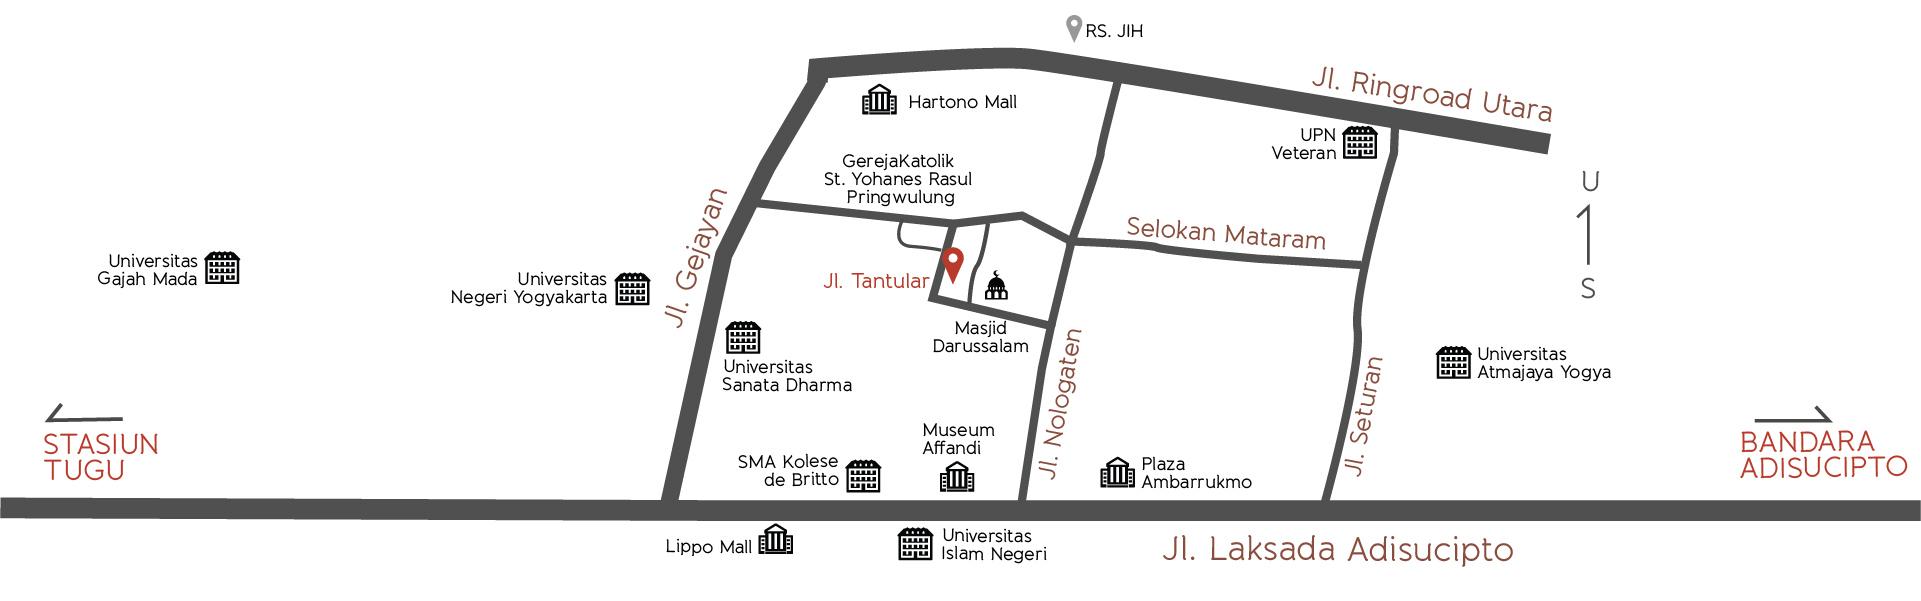 maps-01